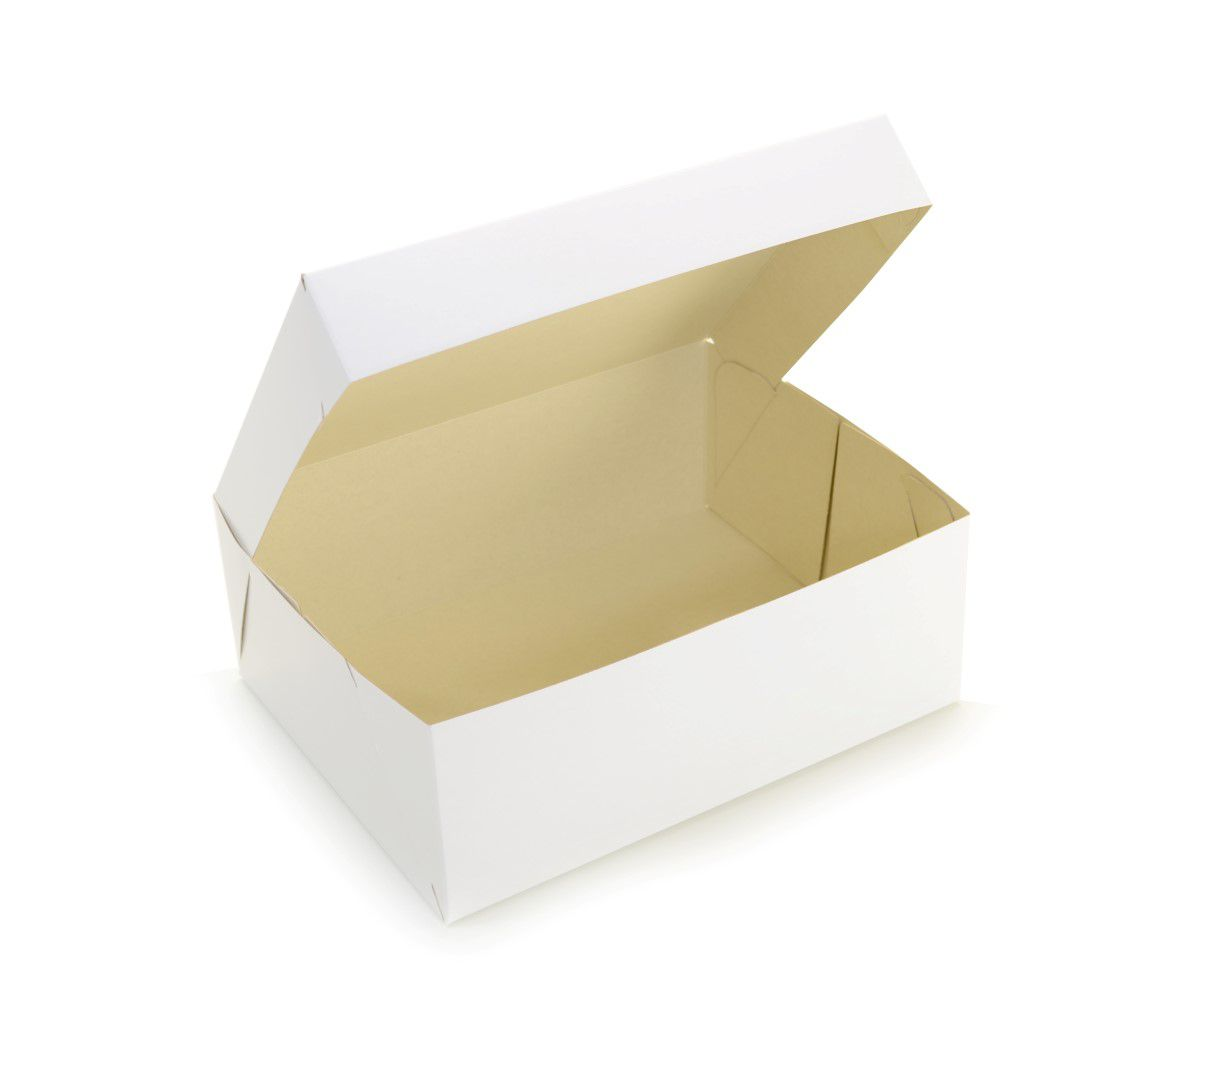 Ref 102 Branca - Caixa Baú - 24x18,5x9 cm - c/ 10 unidades